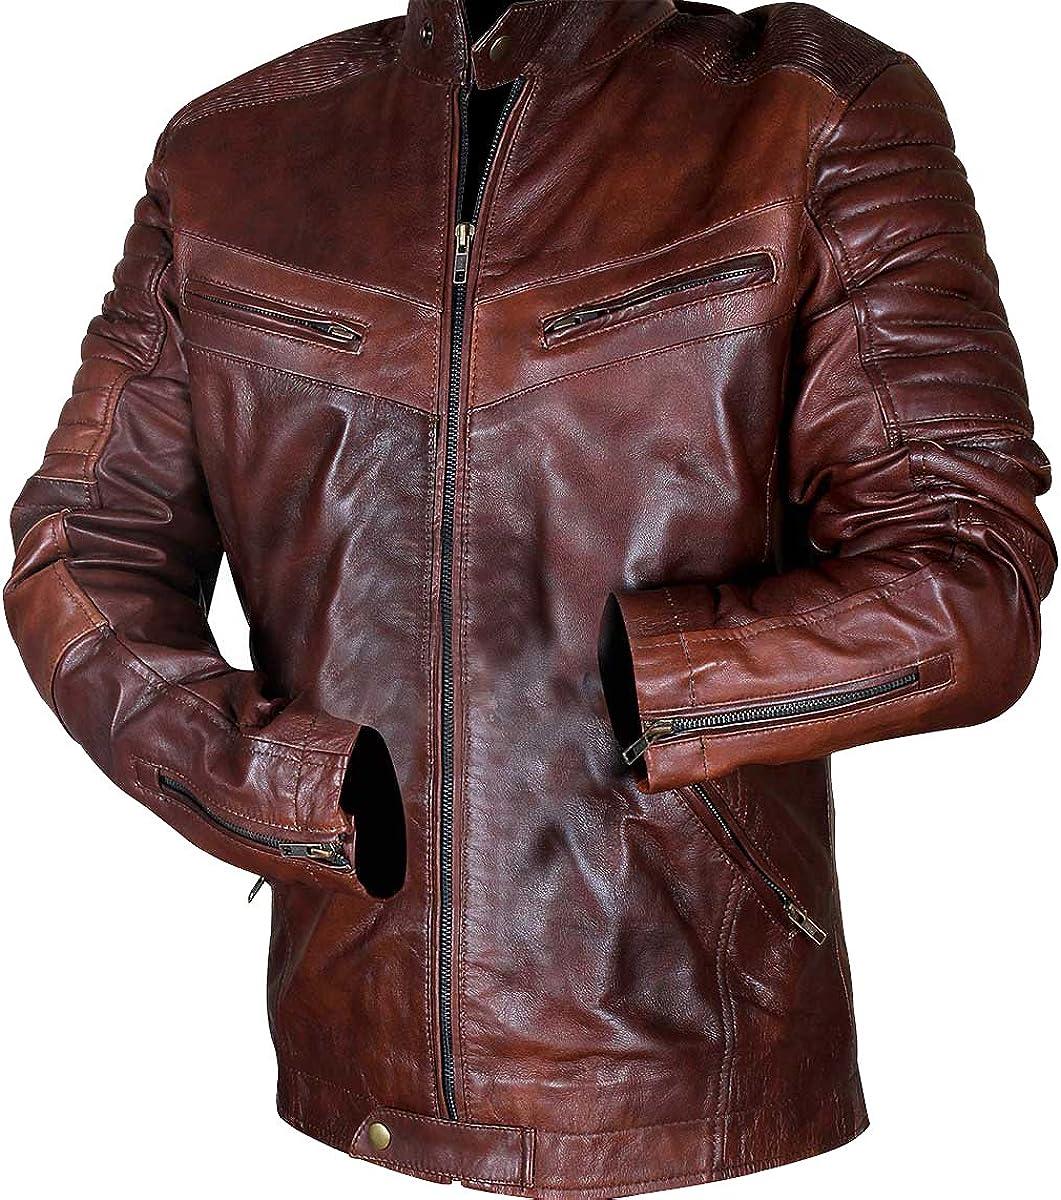 Vintage Motorcycle Distressed Brown Mens Biker Quilted Cafe Racer Retro Leather Jacket